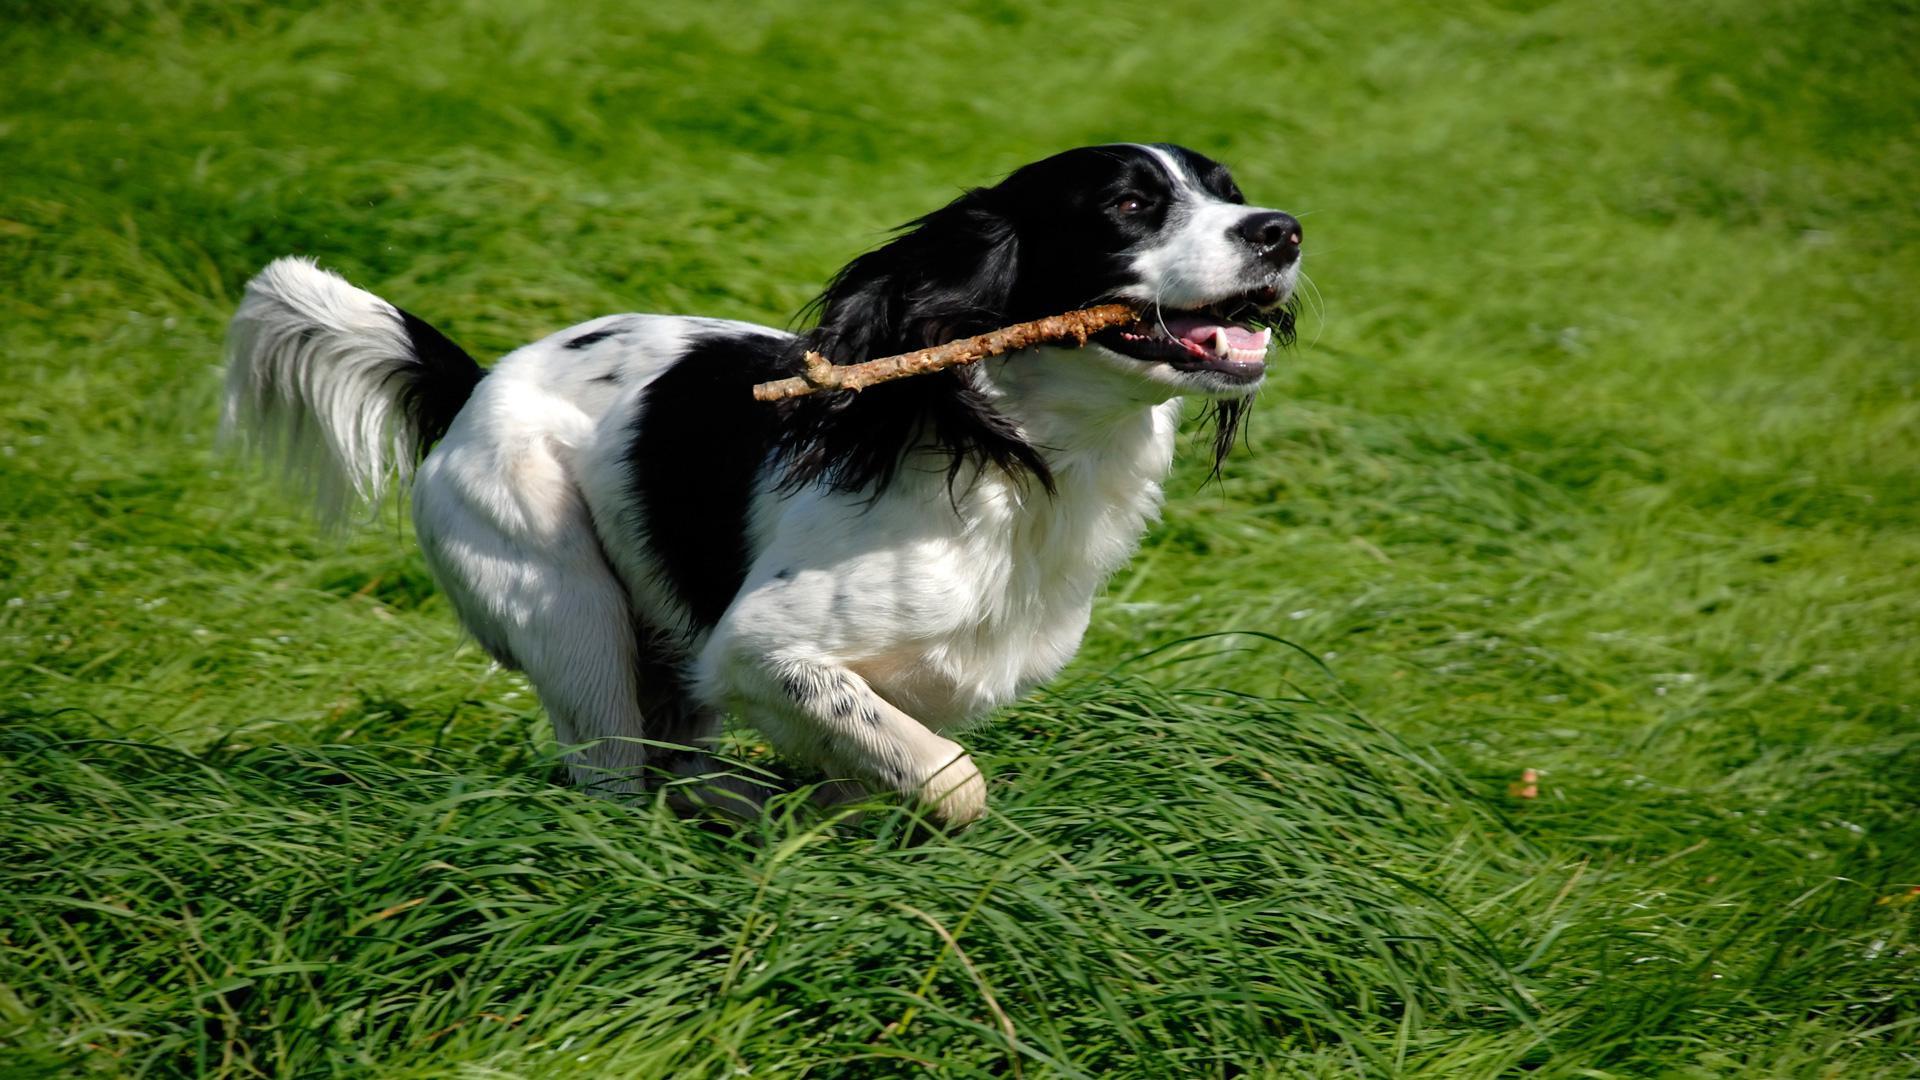 Meet the breed: English Springer Spaniel